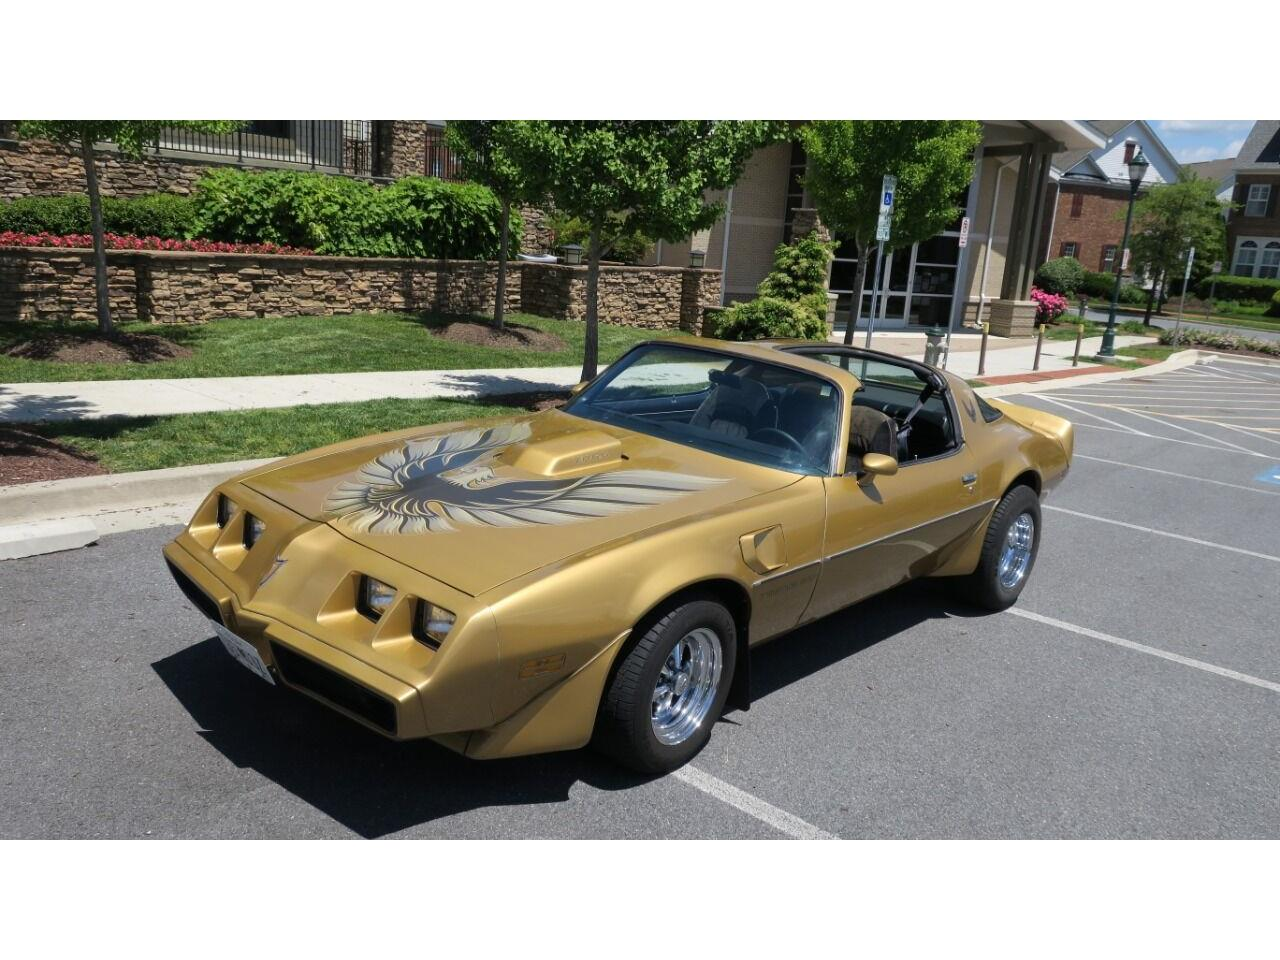 1979 Pontiac Firebird Trans Am (CC-1354515) for sale in Clarksburg, Maryland